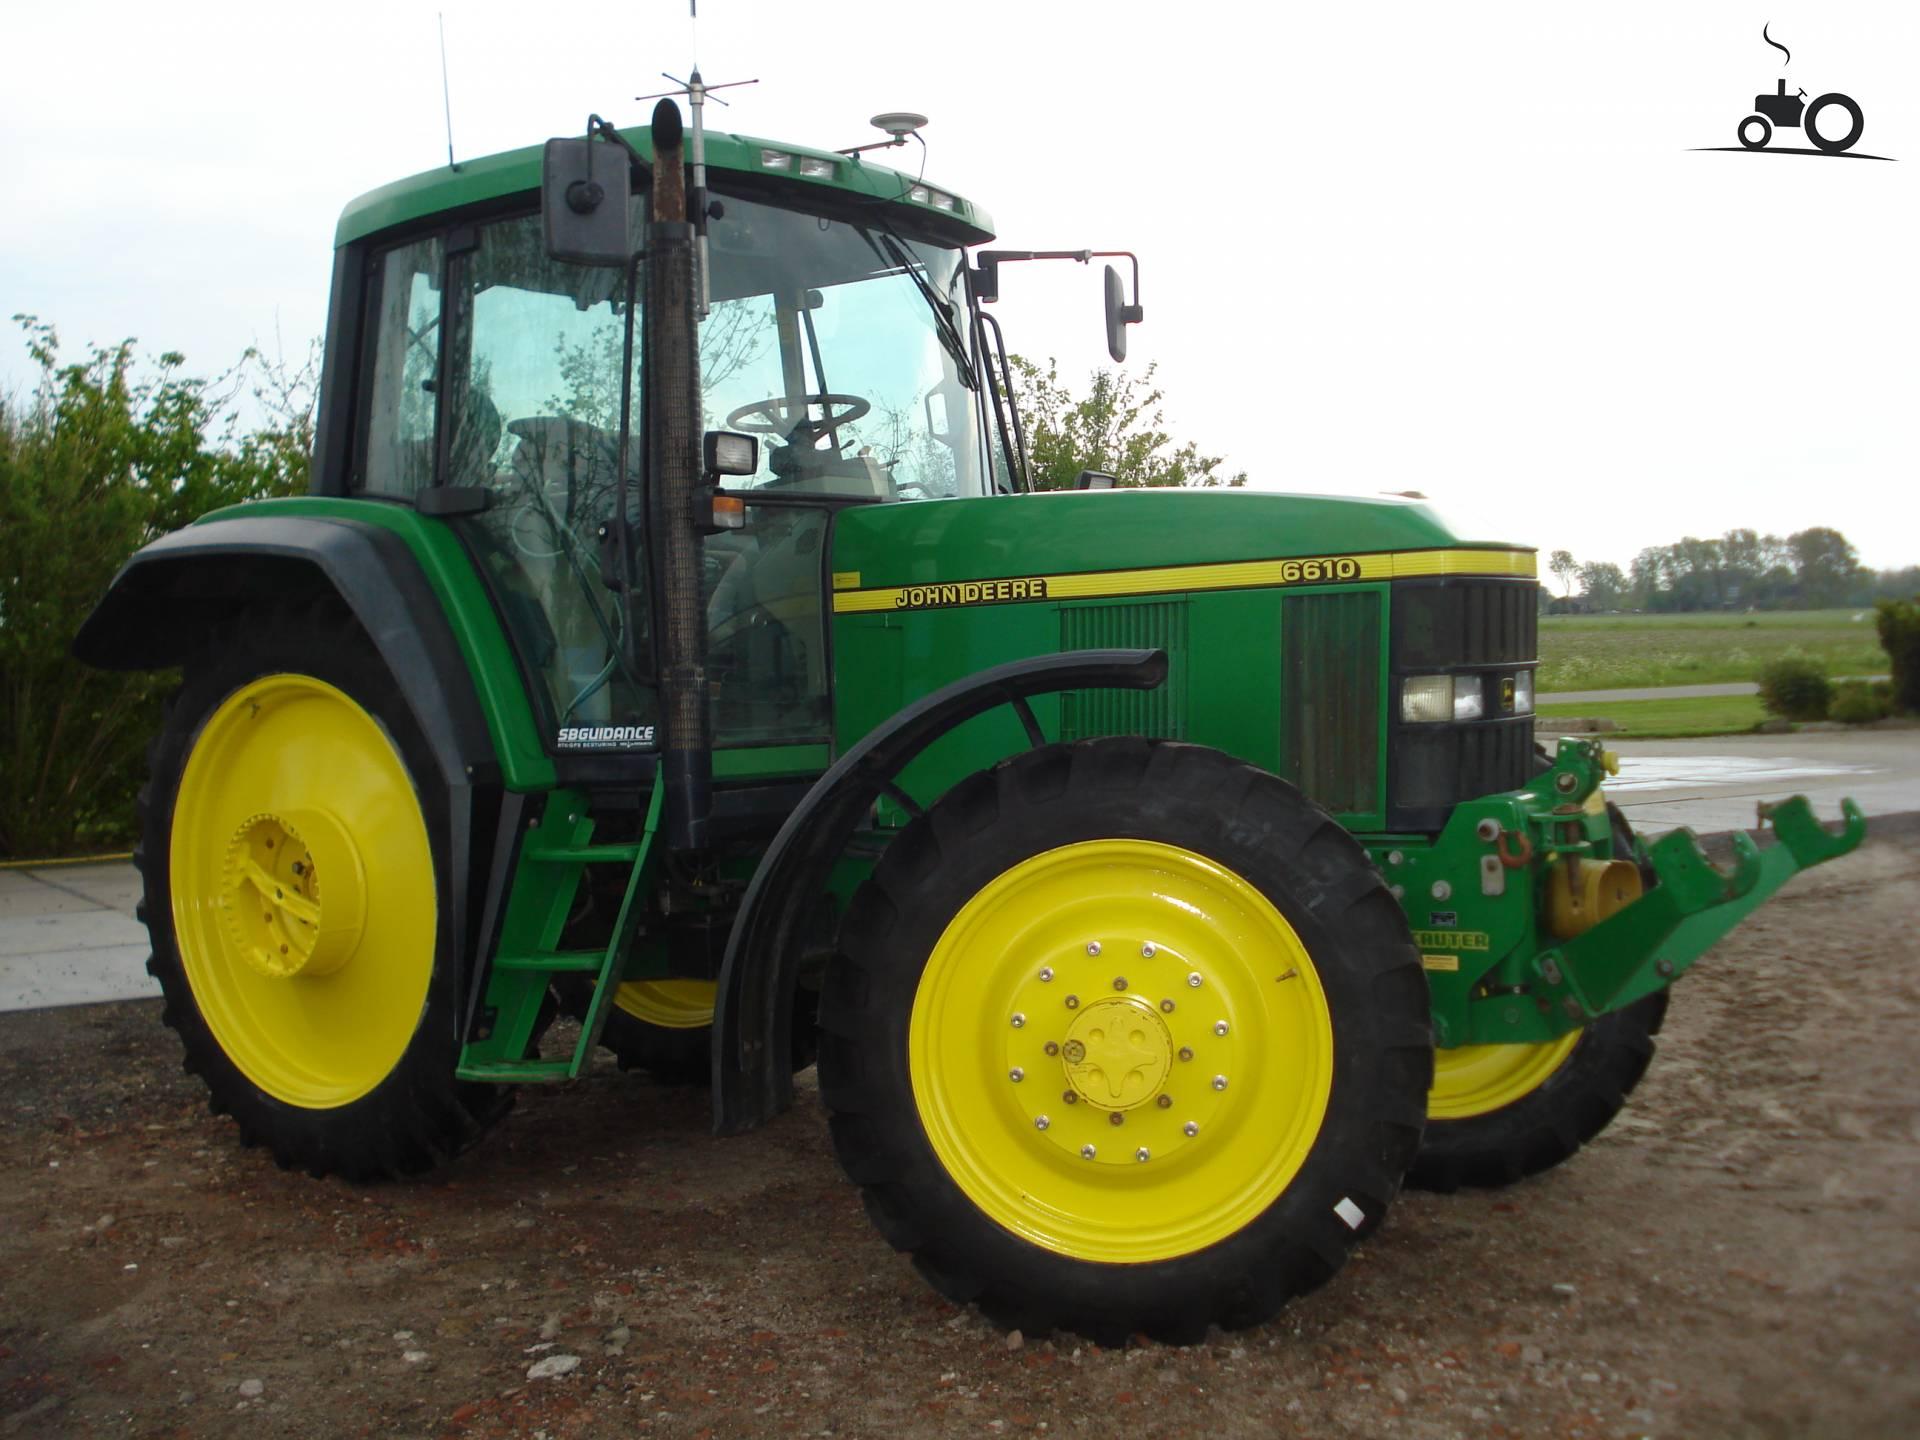 New John Deere Tractor Fuel Injectors - Tractor Parts Inc.